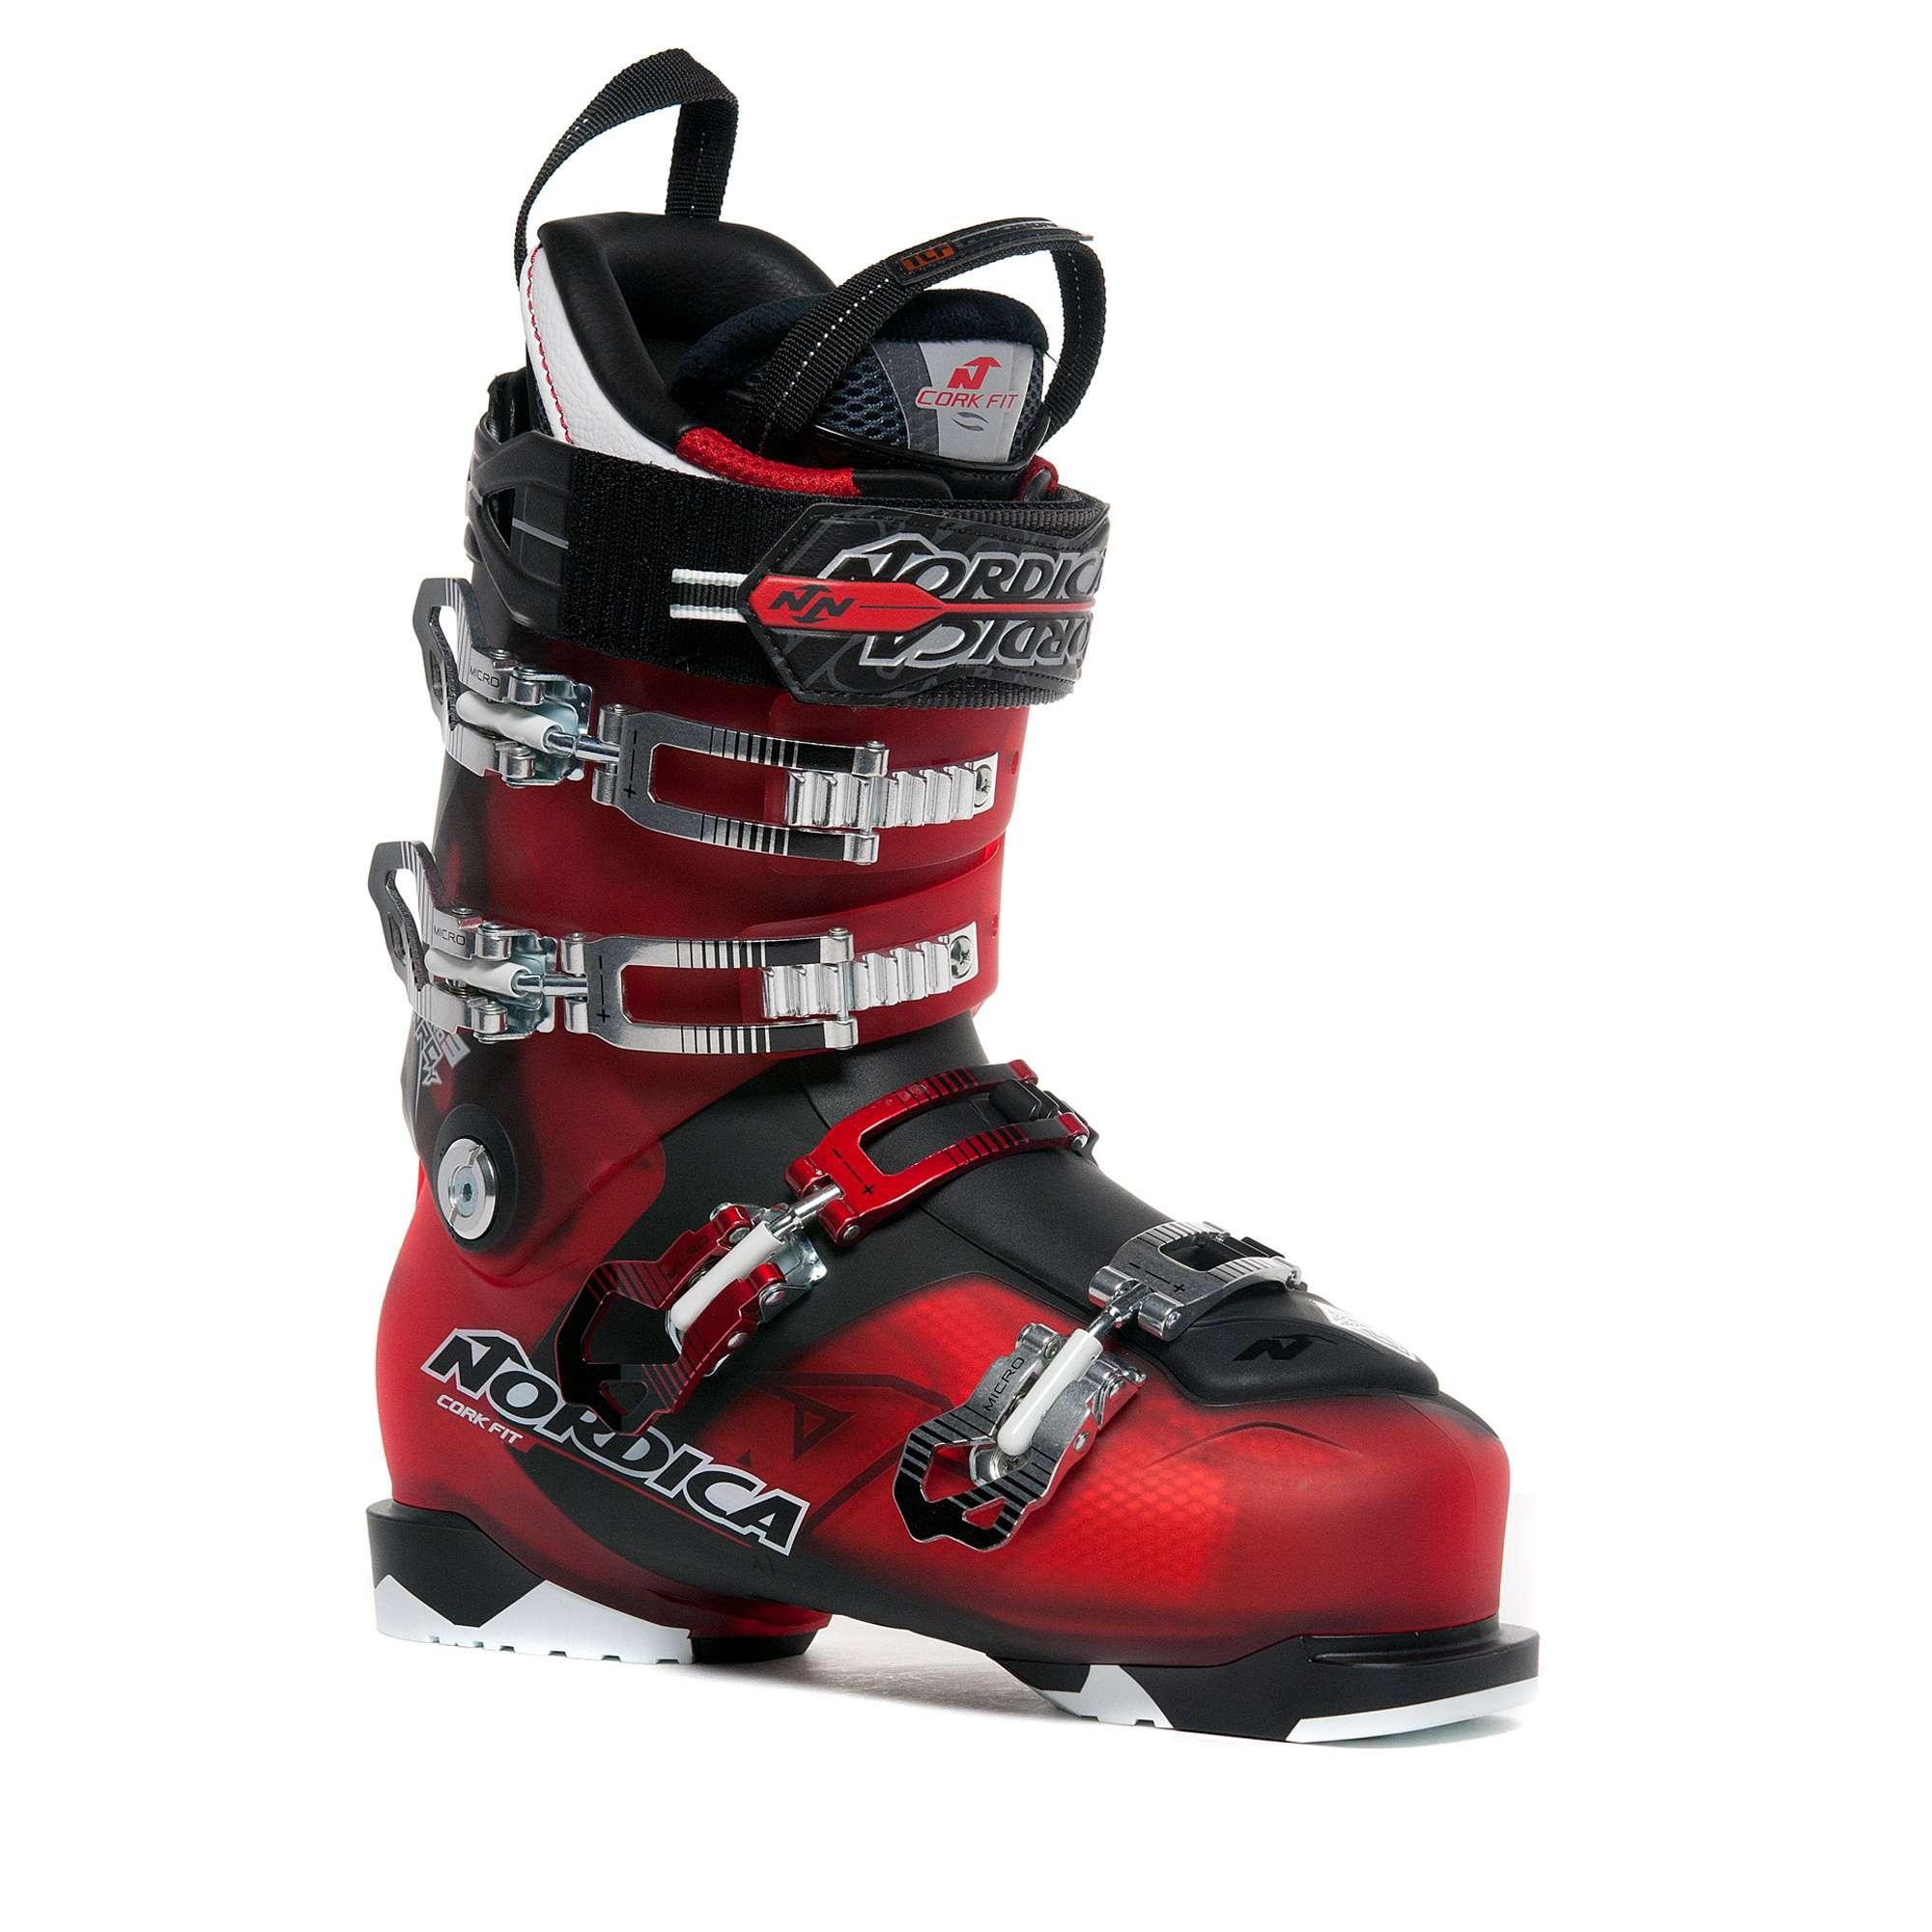 NORDICA NRGy Pro 3 Ski Boots